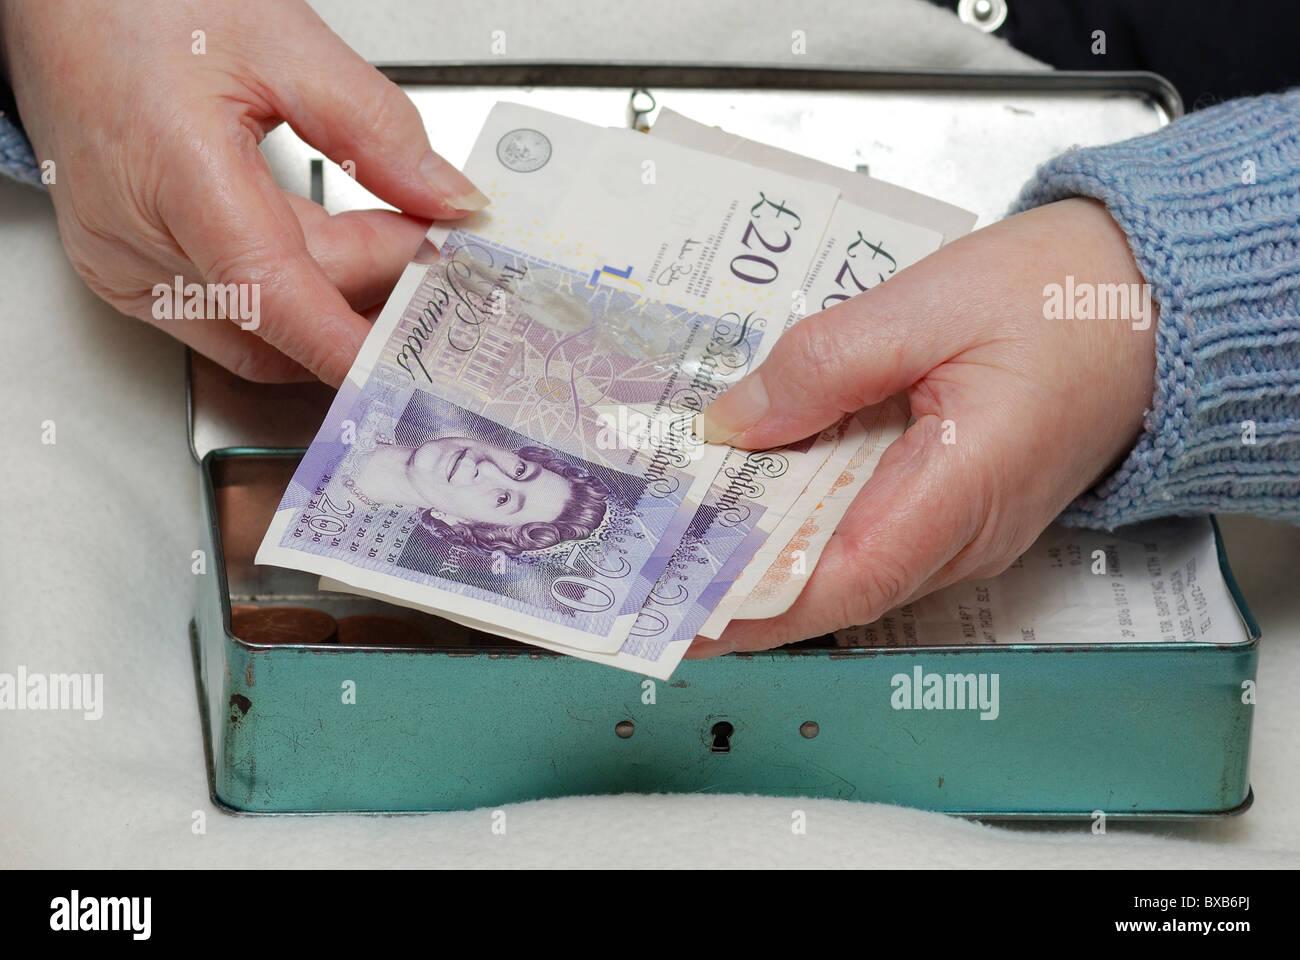 pensioner holding 20 pound notes with cash tin england uk - Stock Image